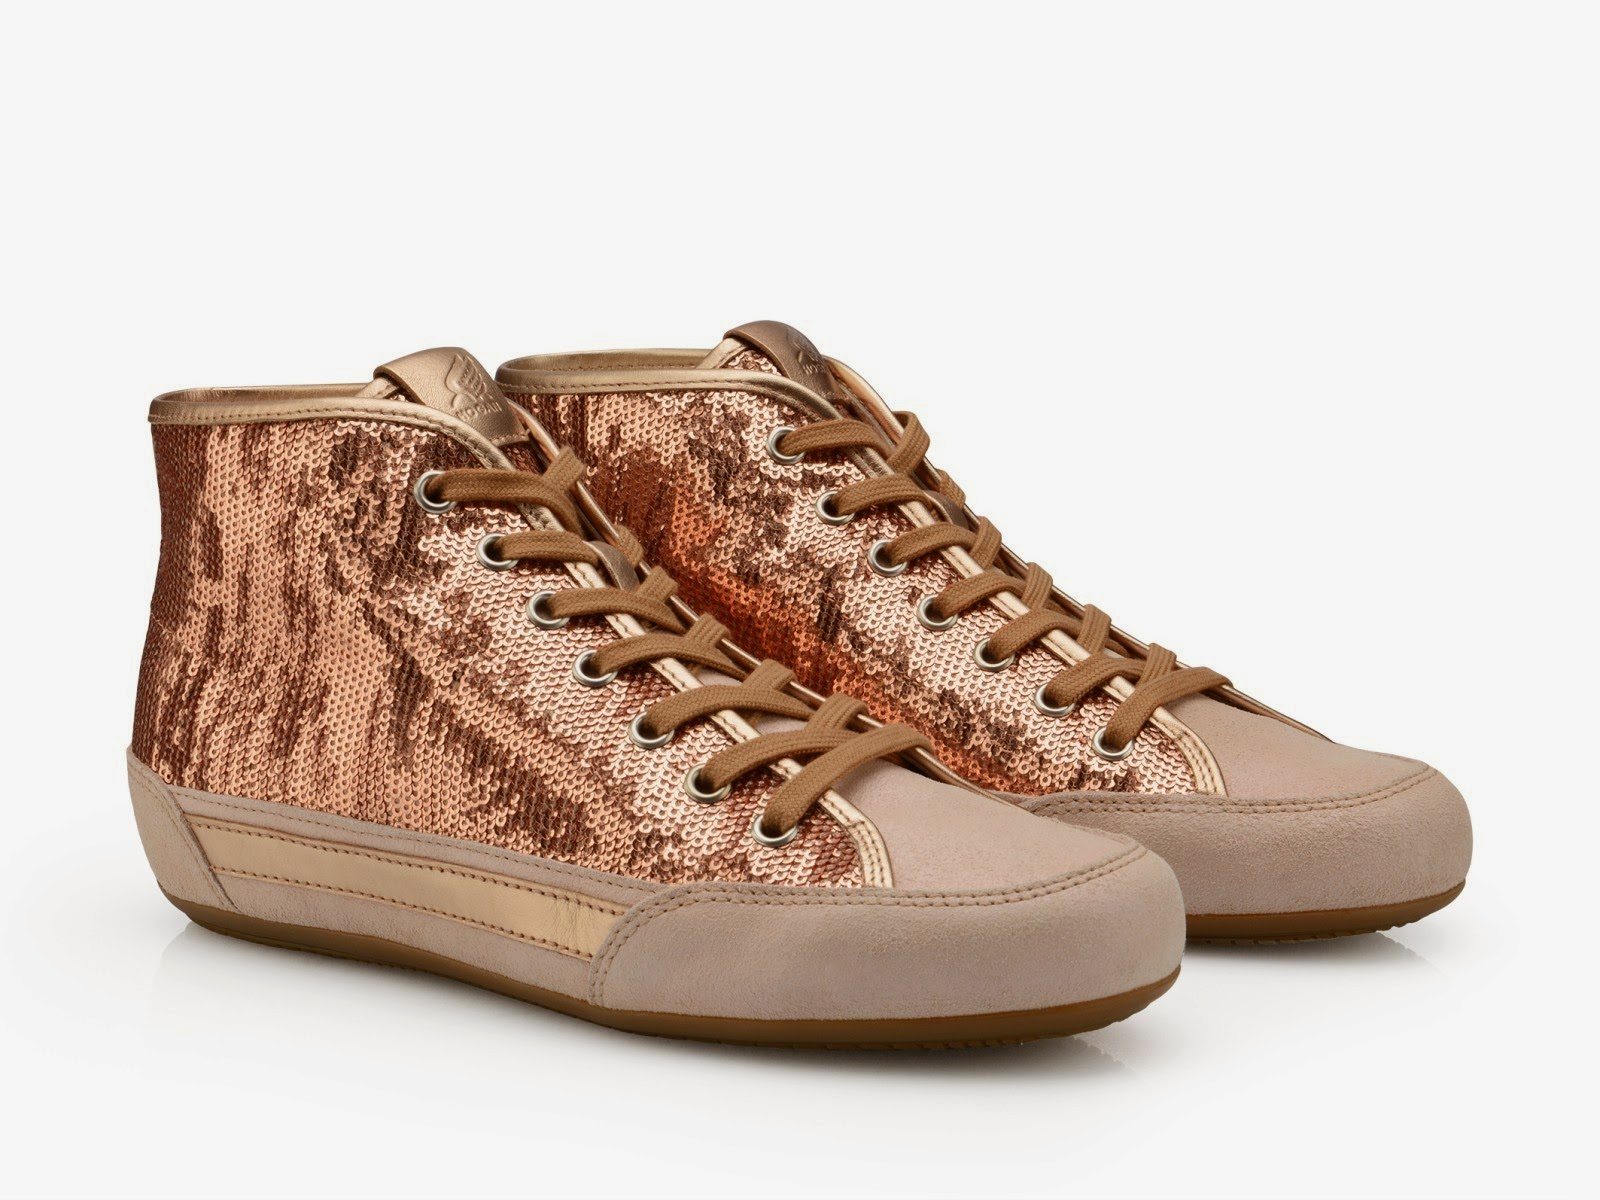 outlet di scarpe hogan